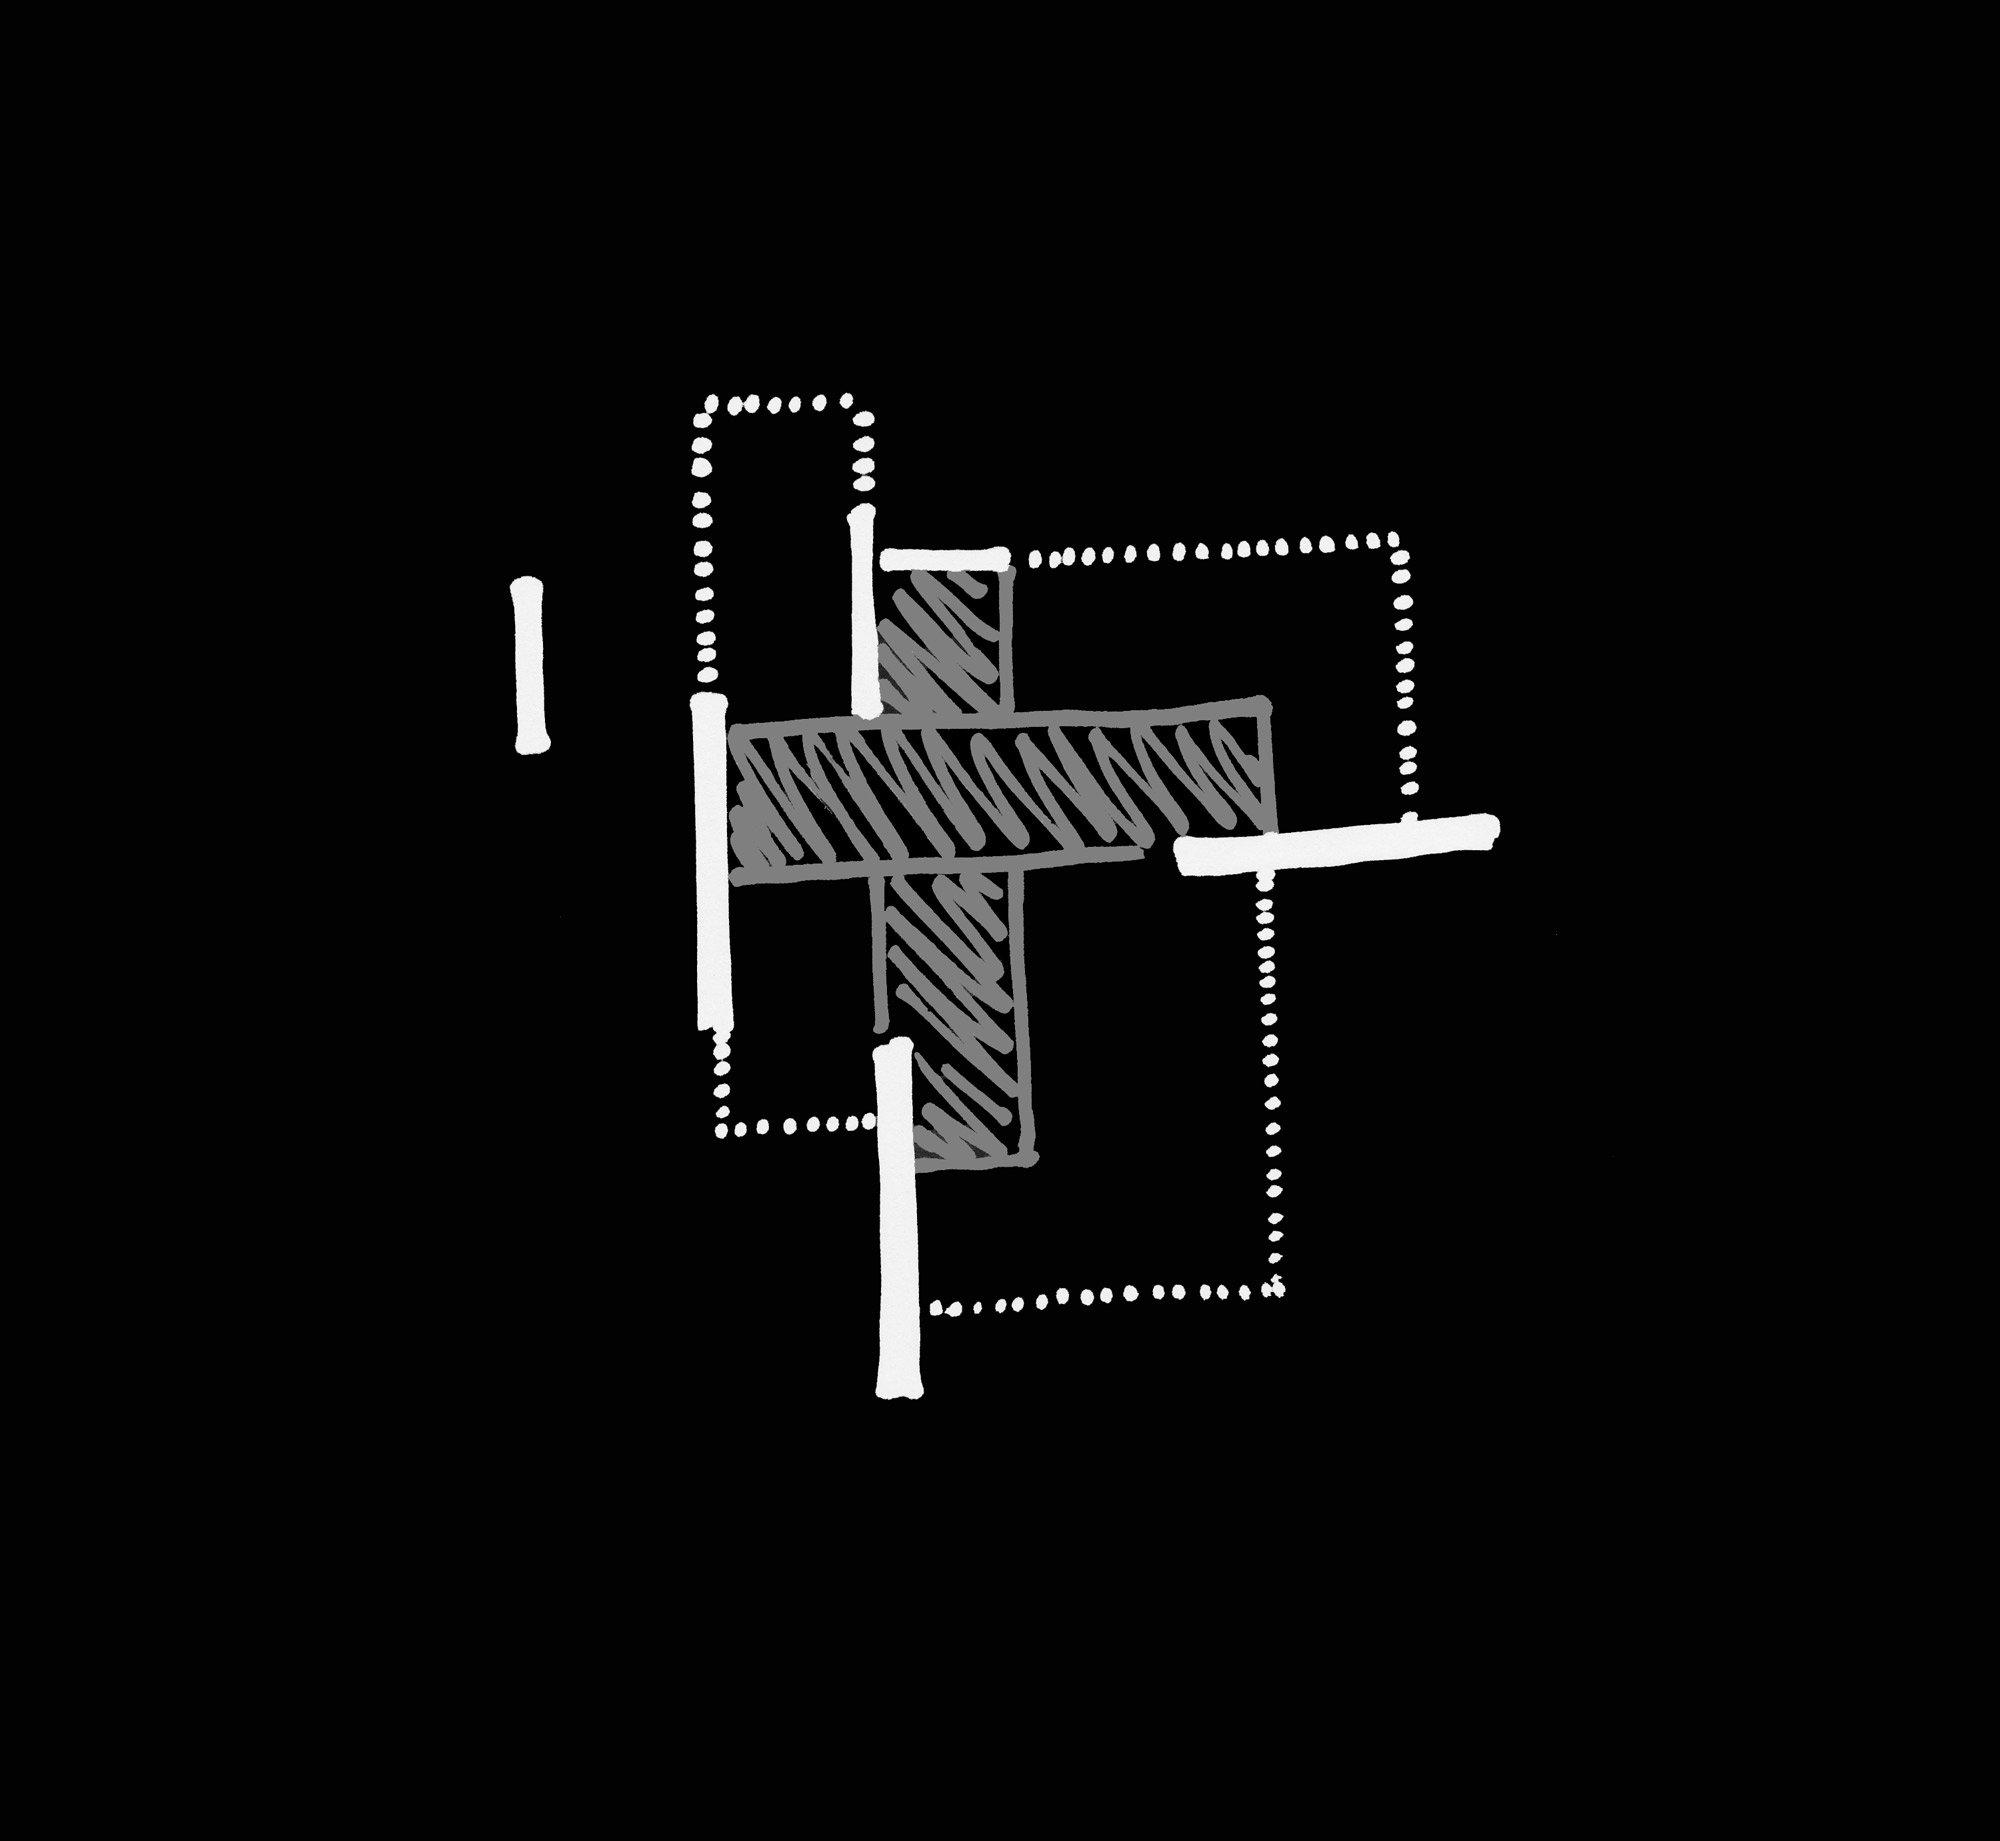 Concept © Spasm Design